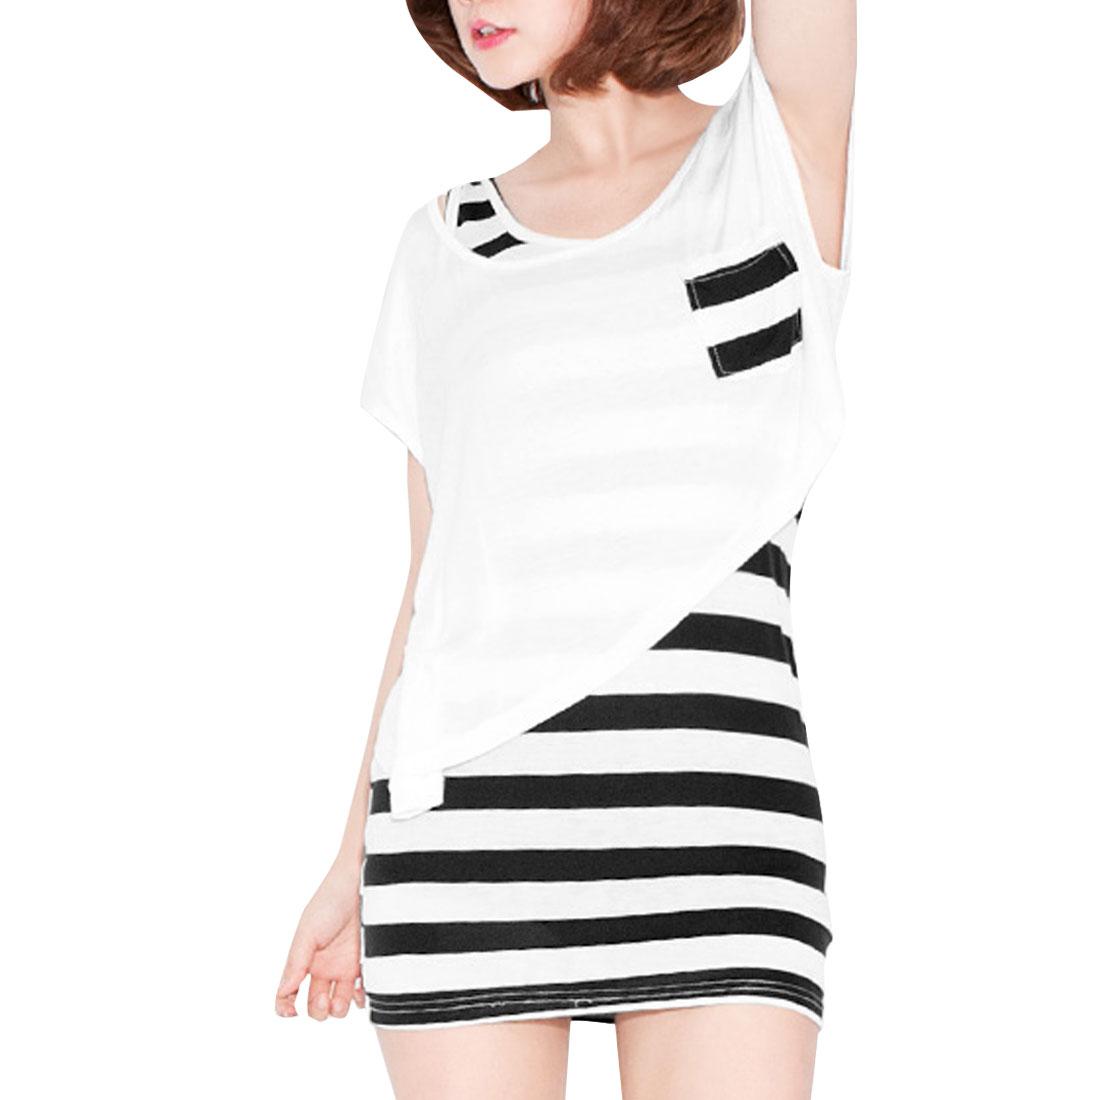 Ladies Irregular Hem Blouse w Sleeveless Stripes Pattern Slim Fit Dress Black White XS